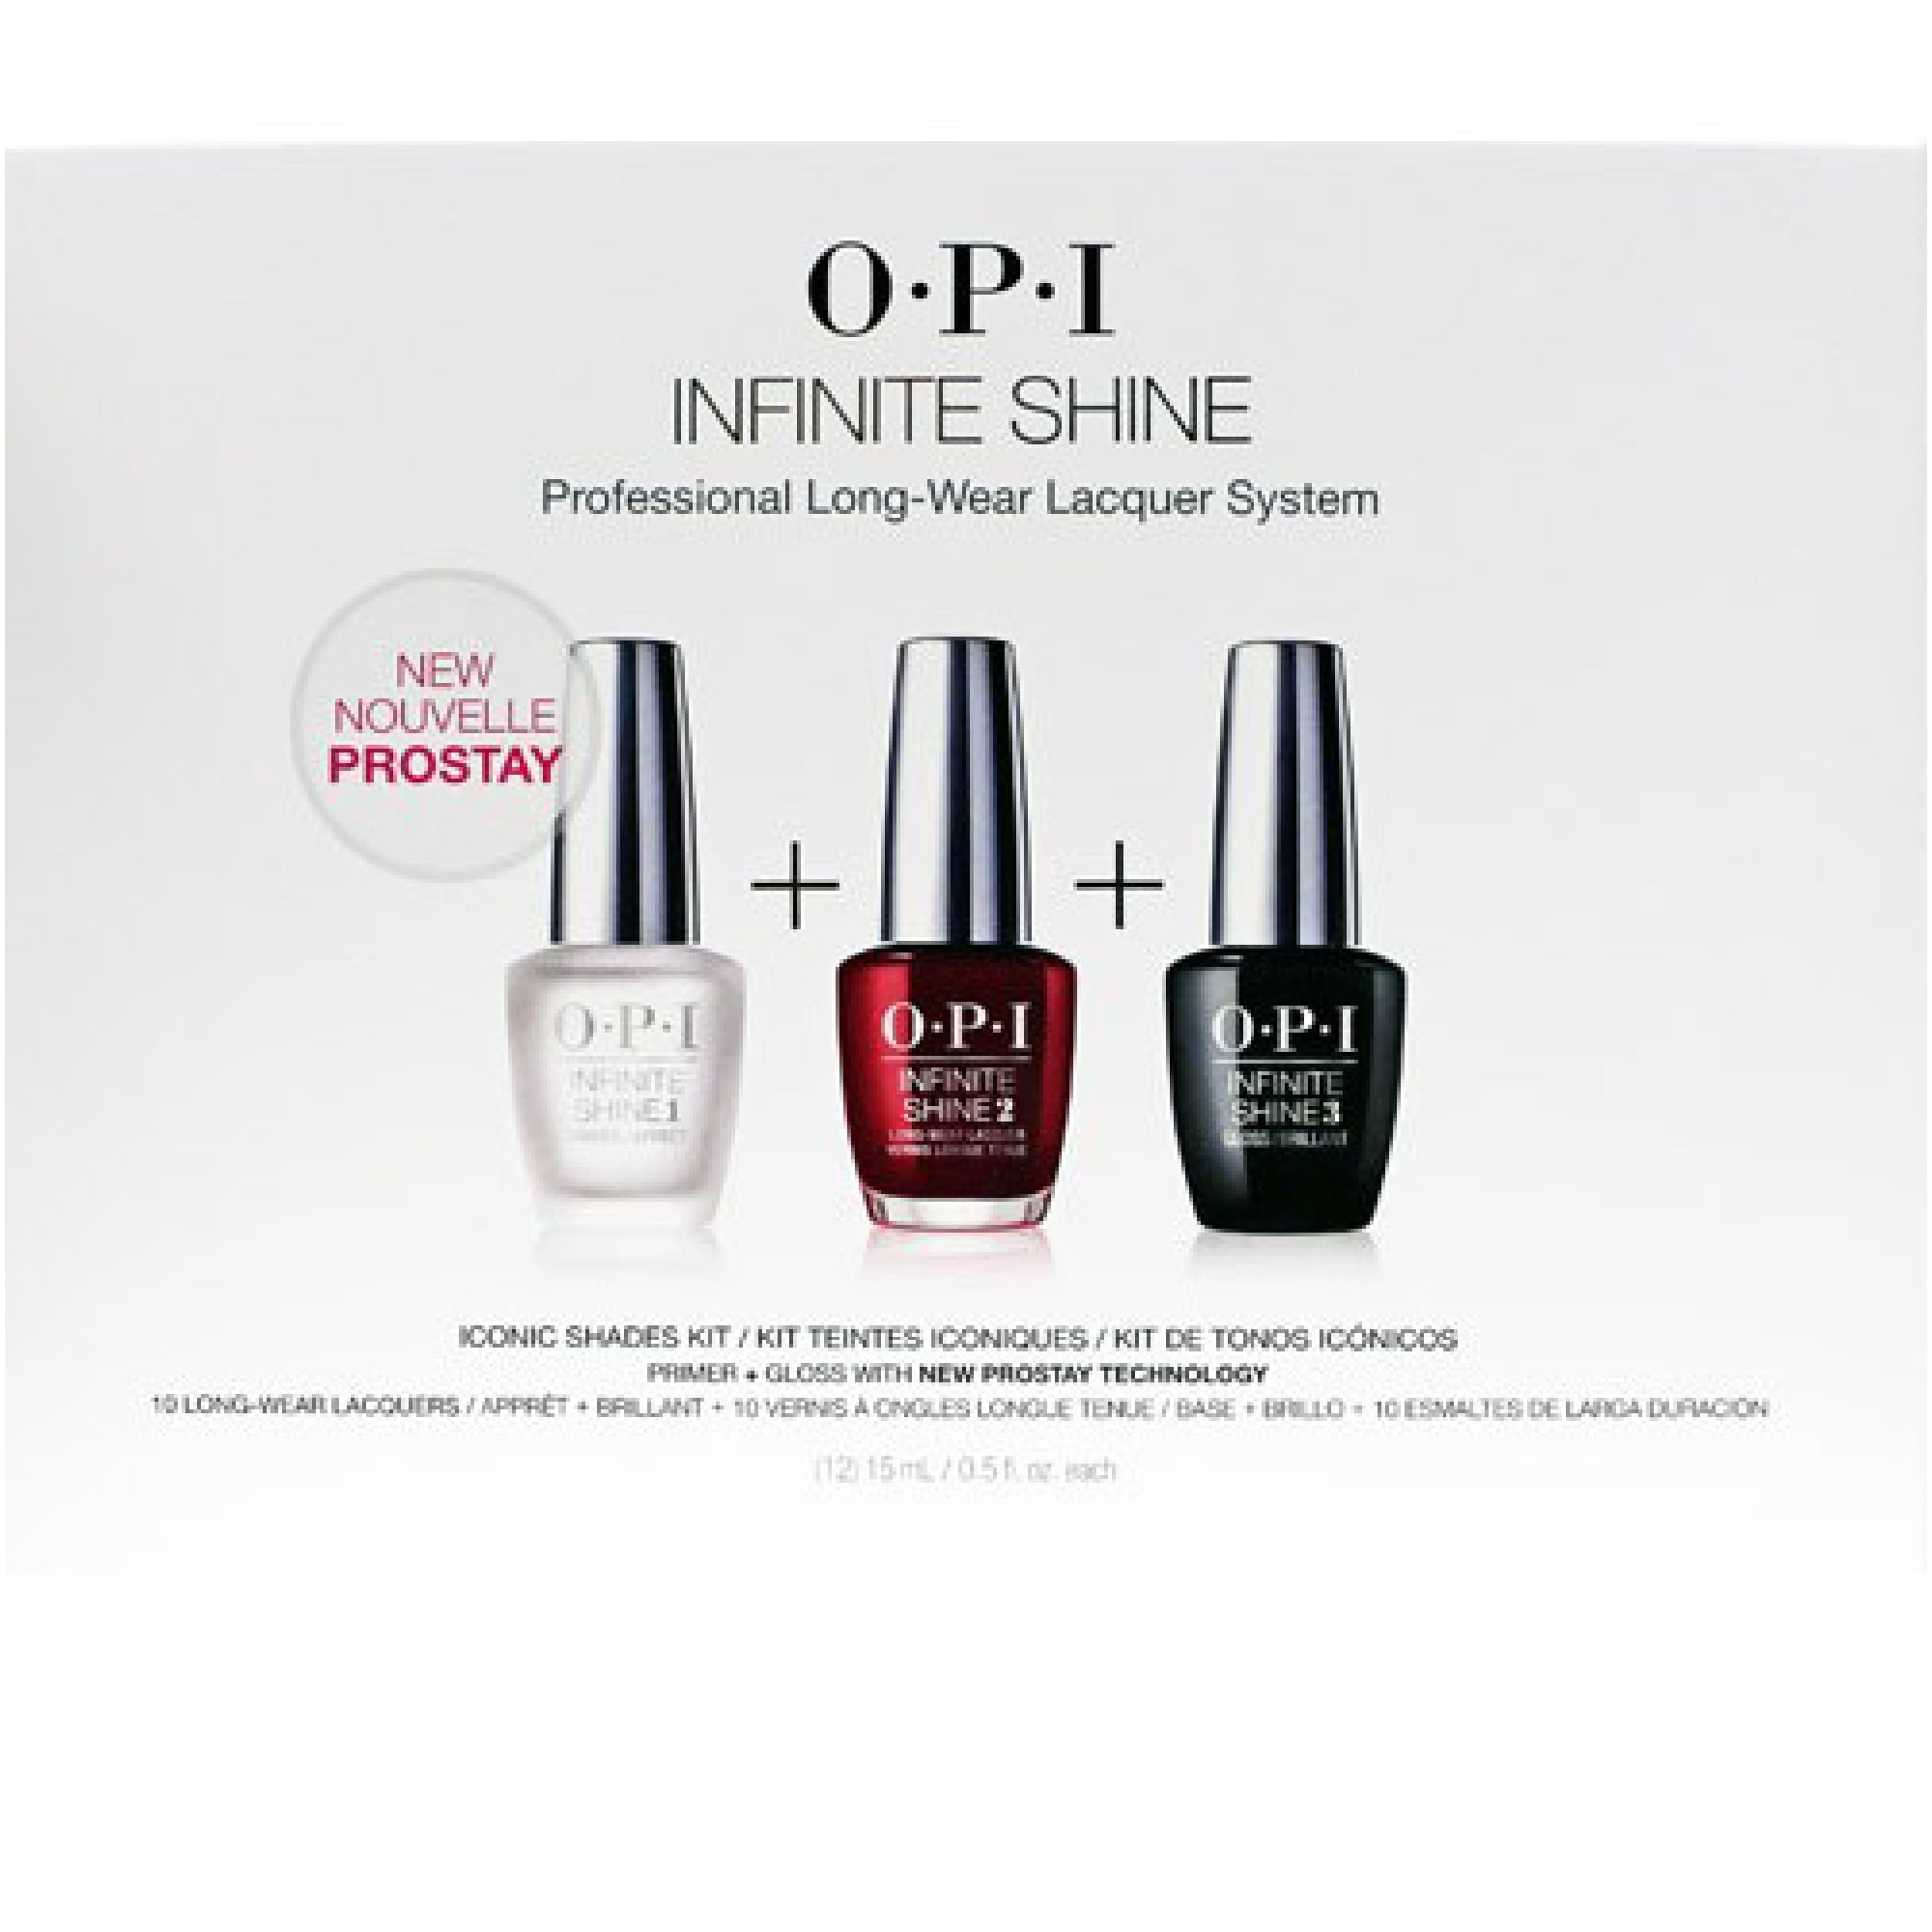 OPI Infinite Shine Professional System Iconic Shades Kit (12 x 15ml)